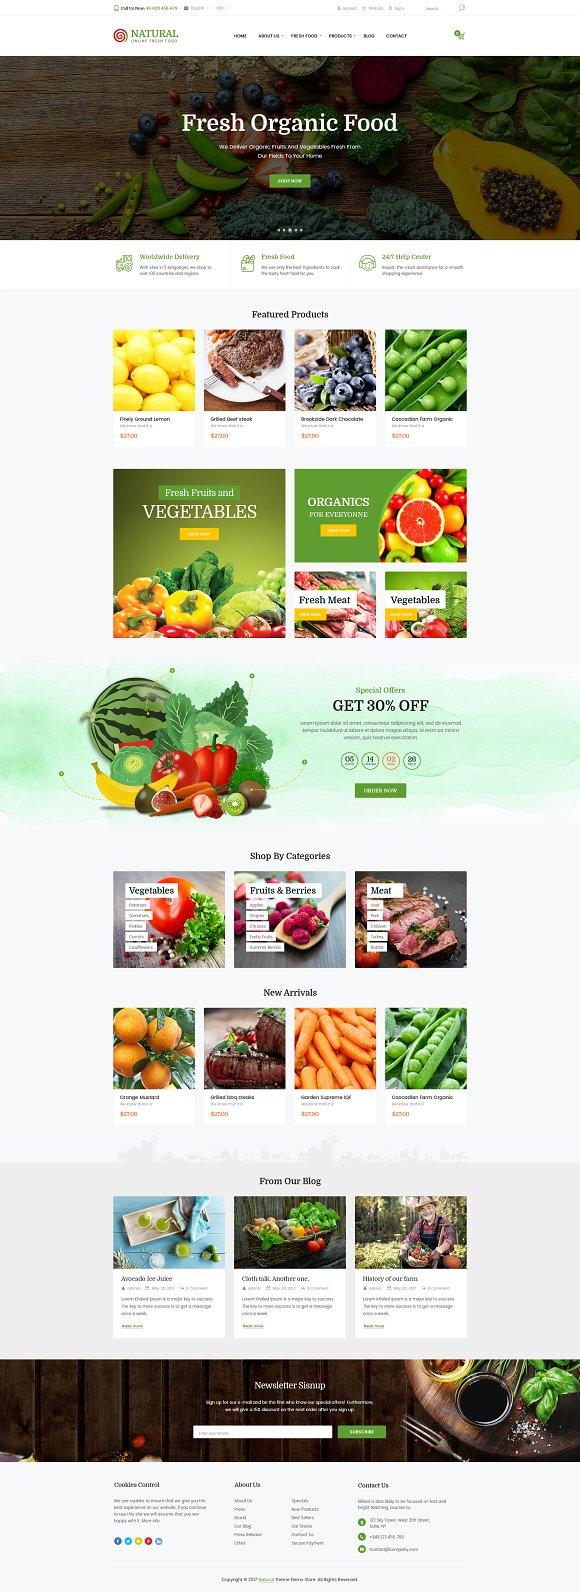 Natural online food wordpress them wordpress commerce themes natural online food wordpress them wordpress commerce themes creative market forumfinder Choice Image